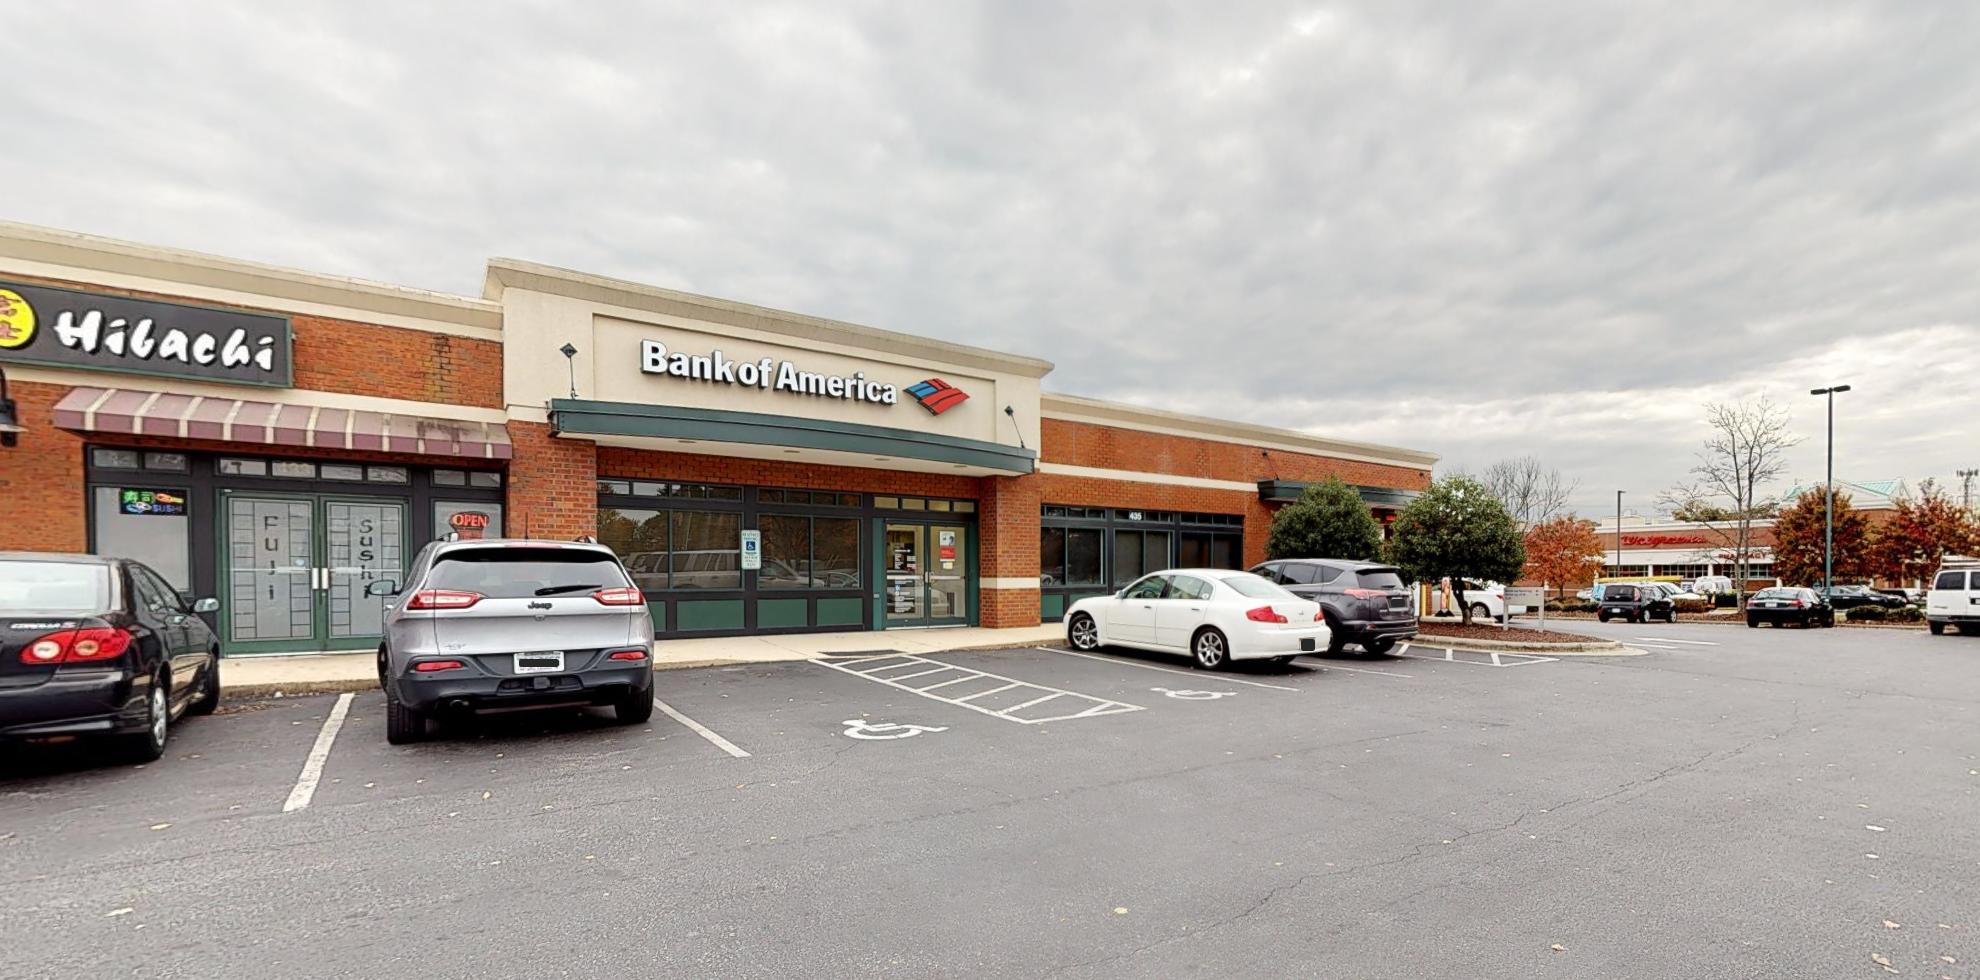 Bank of America financial center with drive-thru ATM   435 Pisgah Church Rd, Greensboro, NC 27455